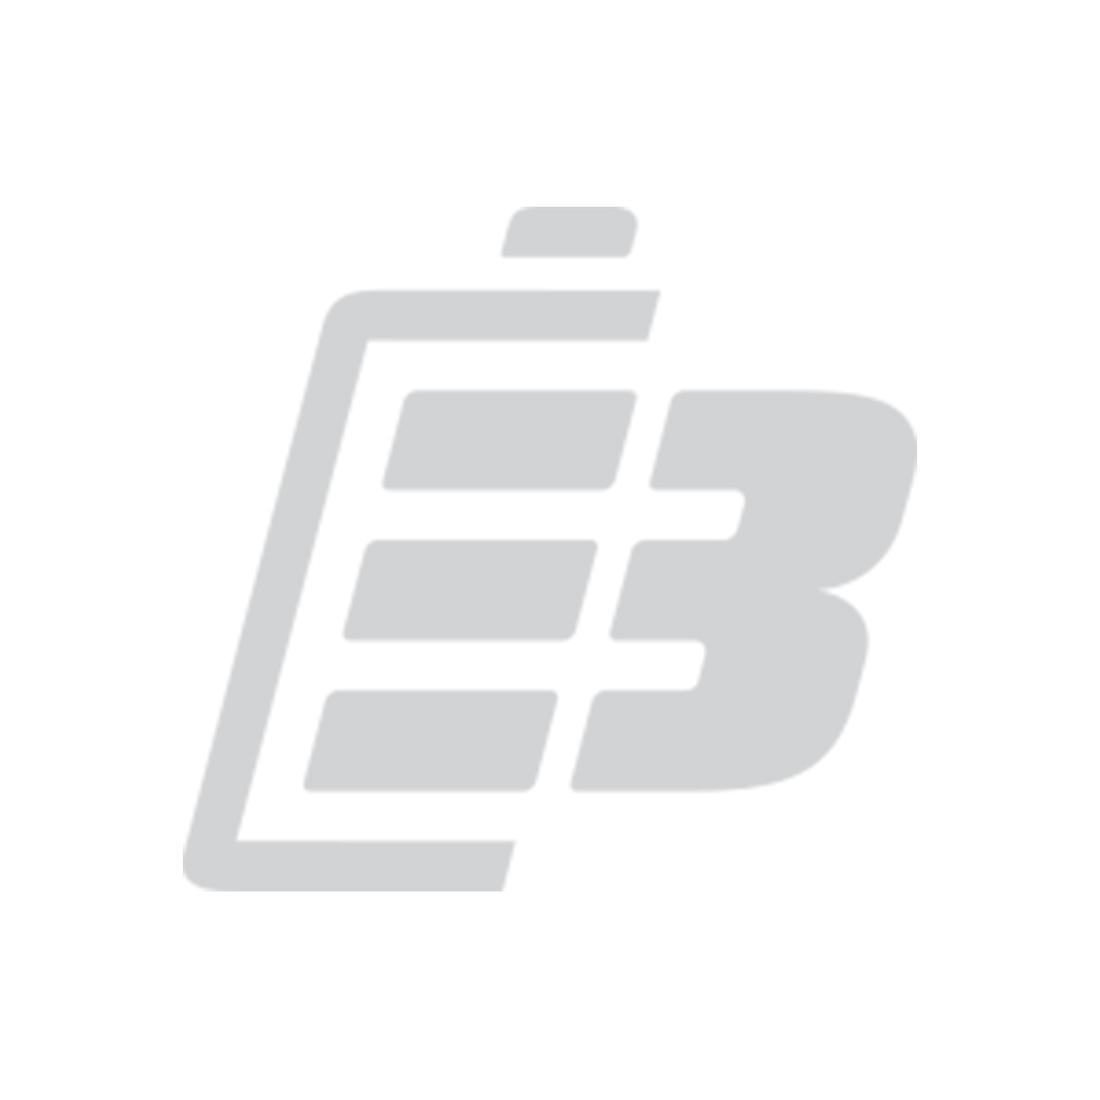 Duracell Industrial MN1203 Alkaline battery 3LR12